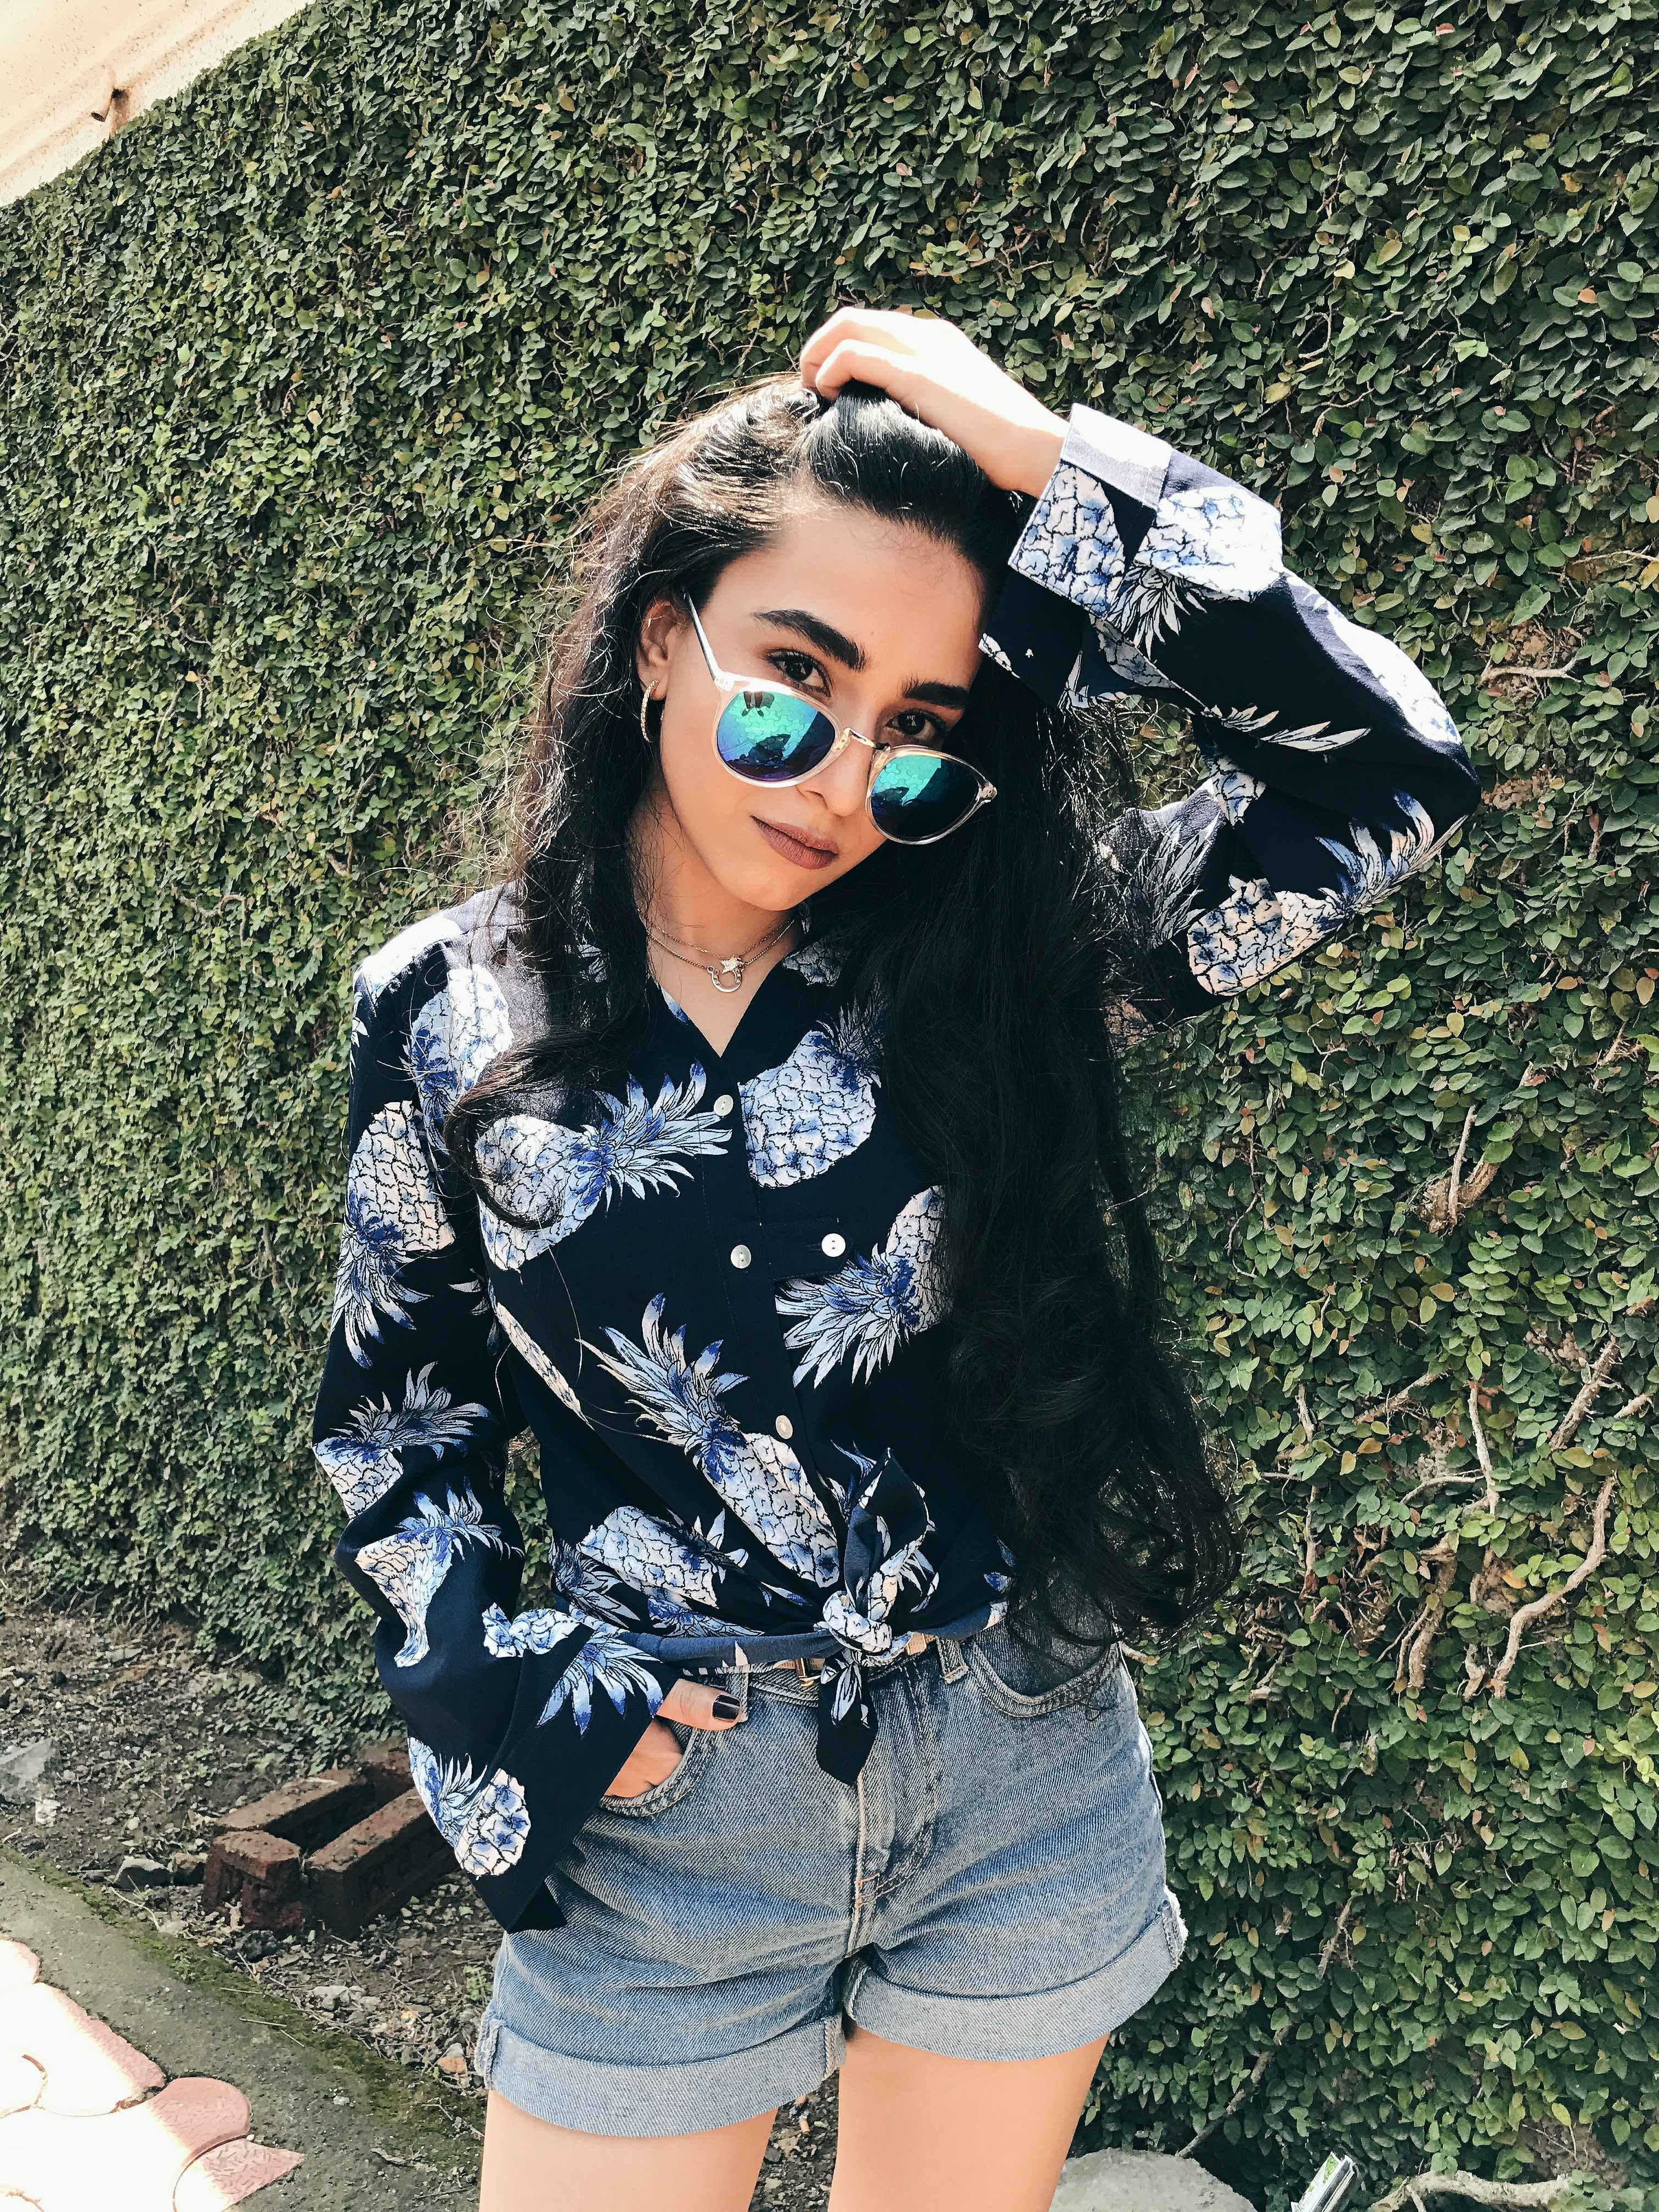 pineapple print shirt, blue shades, denim shorts, printed shirt, spring break, spring ootd,, street style, floral print, LA street style, fashion week